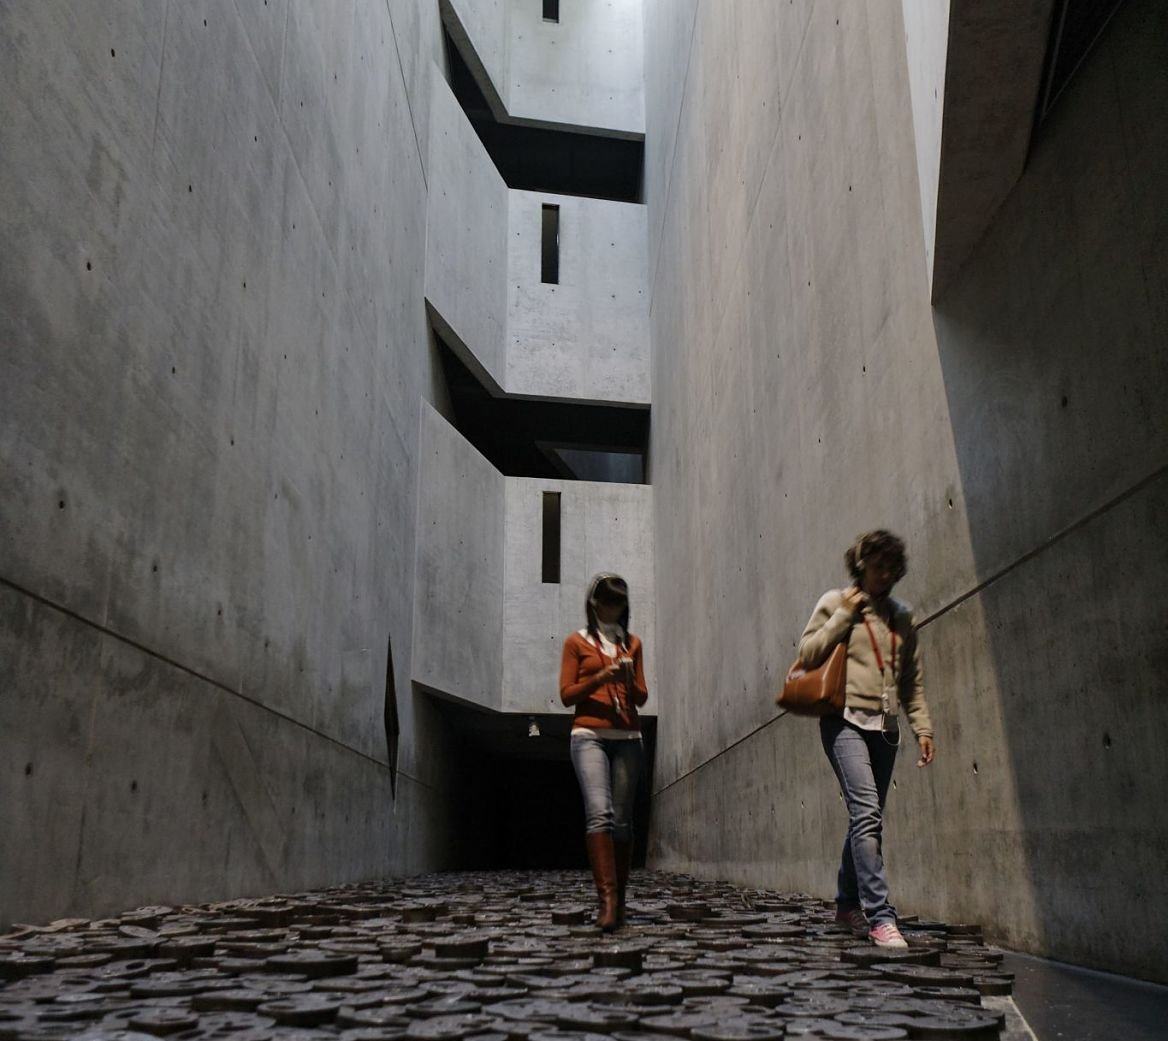 Jüdisches Museum (musée des Juifs), Berlin, Allemagne